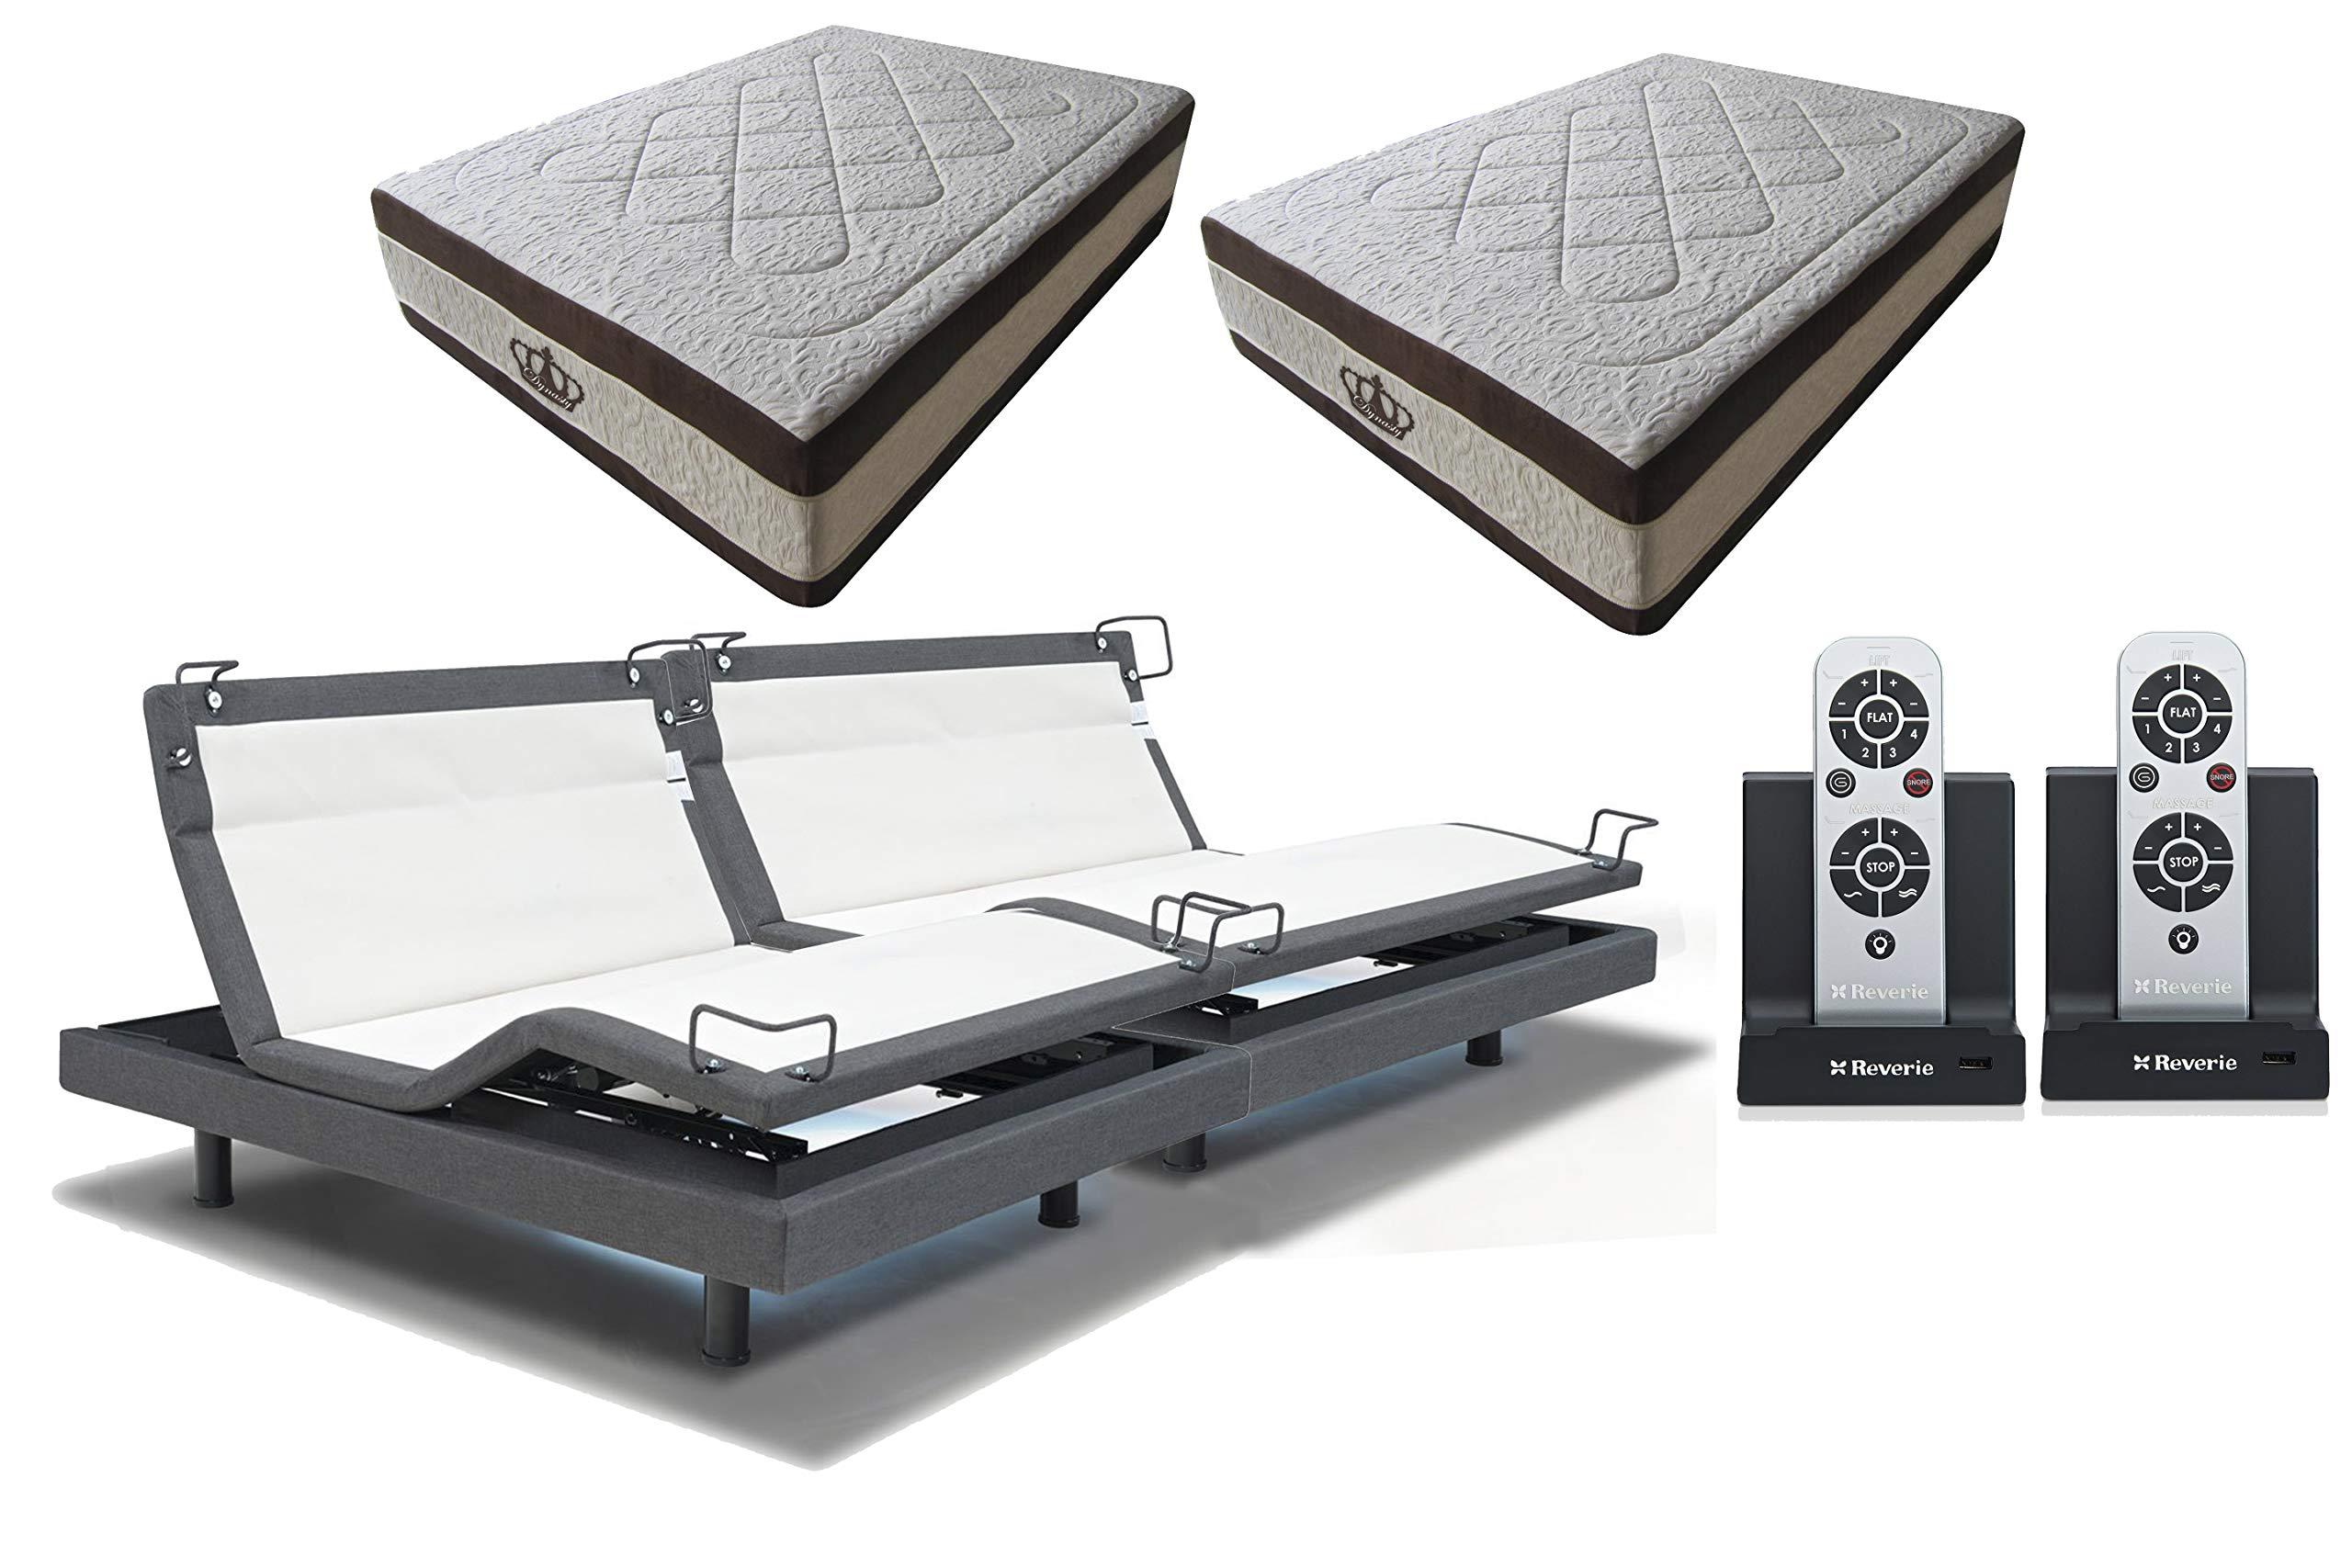 DynastyMattress 15.5-Inch AtlantisBreeze Gel Memory Foam with Reverie 8Q Adjustable Base Set Sleep System (Split King) by DynastyMattress